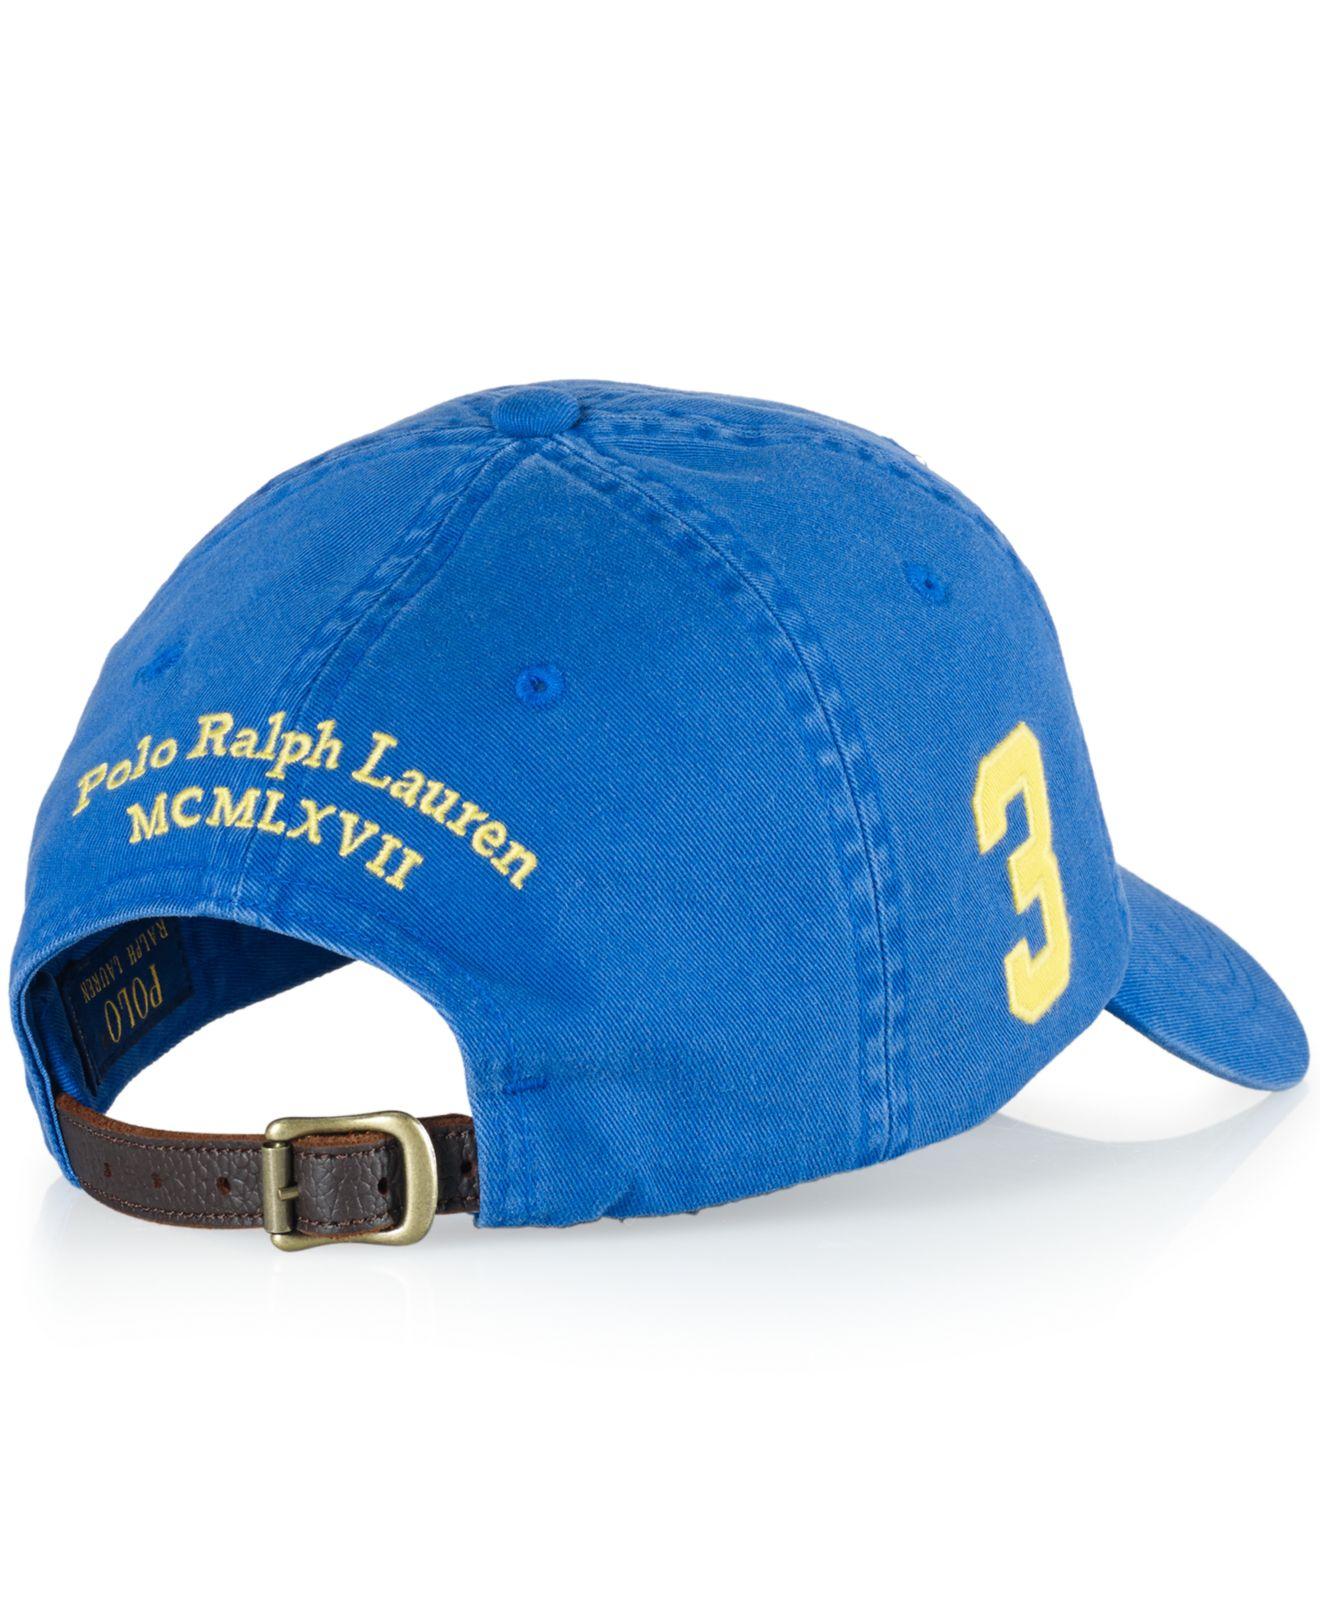 2b7be0e0e Polo Ralph Lauren Classic Chino Sports Cap in Blue for Men - Lyst